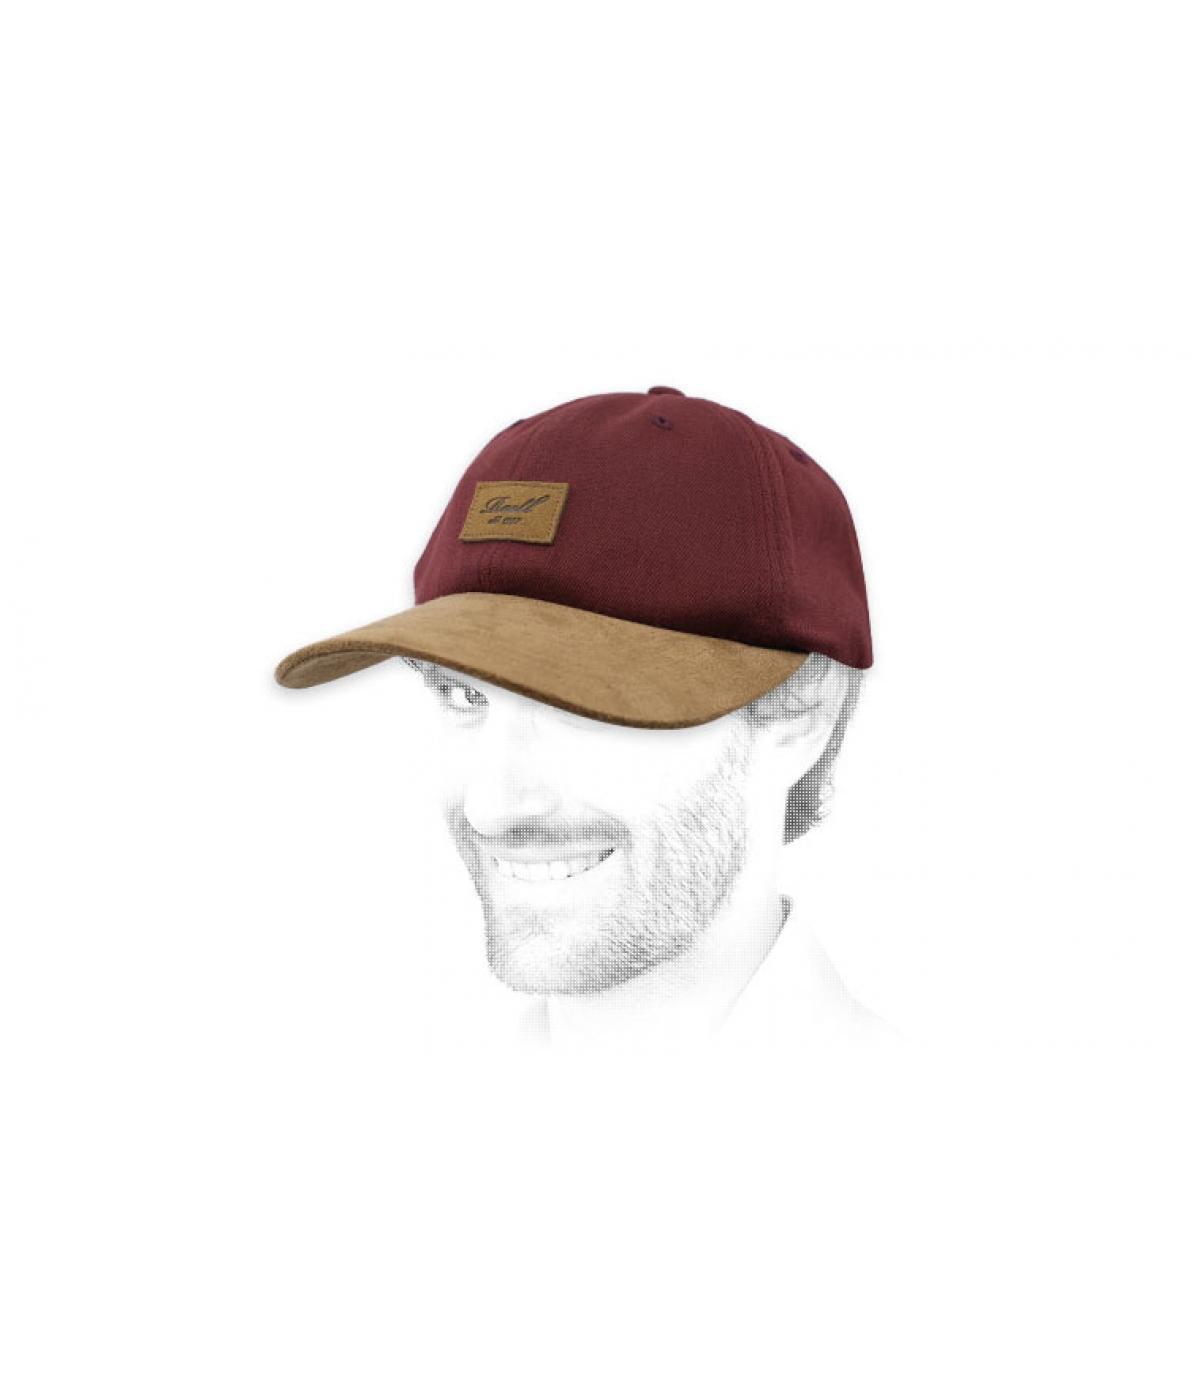 Reell burgundy cap